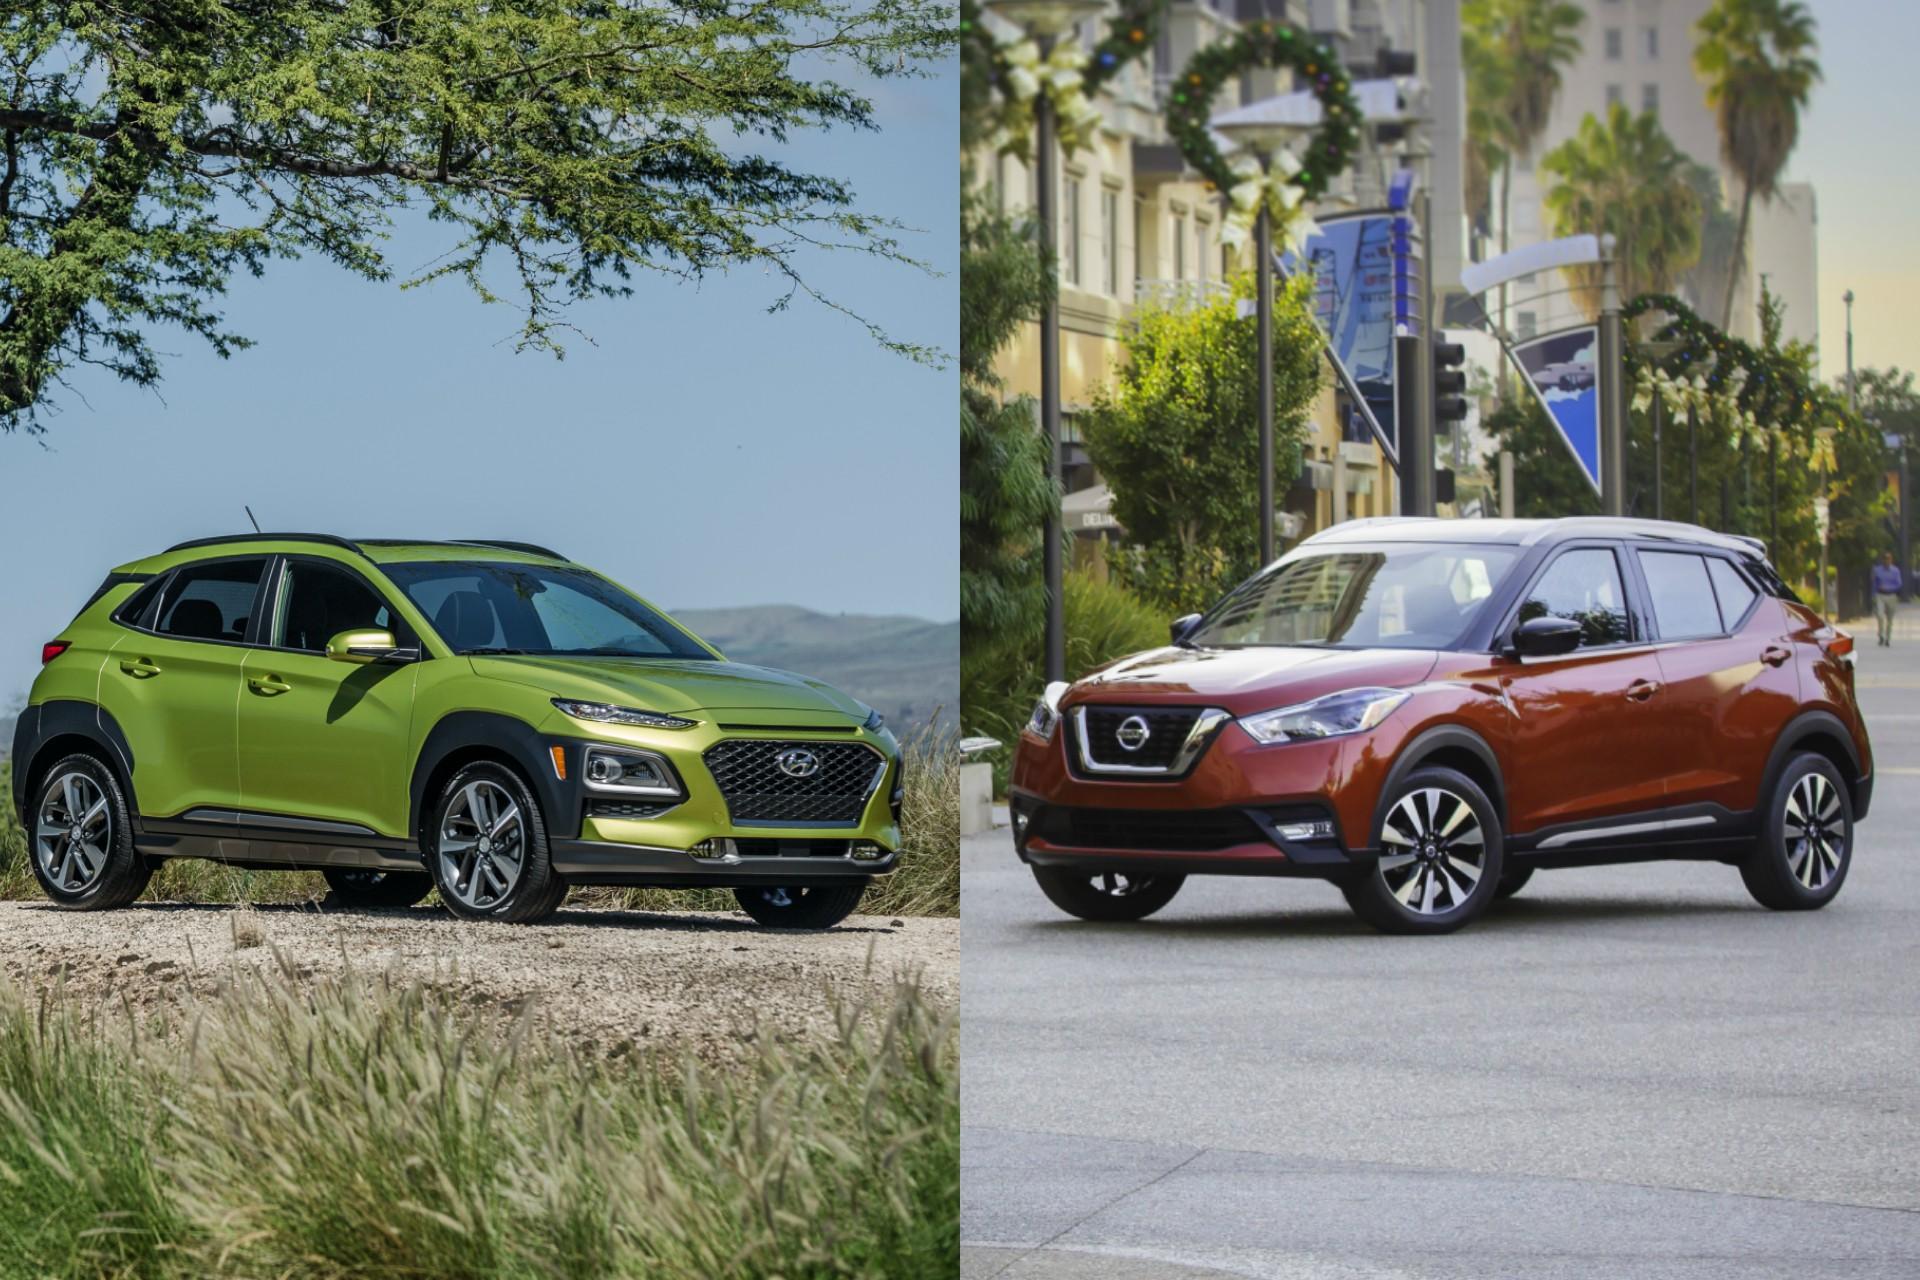 2020 Nissan Qashqai Hybrid Debuts Next Year >> Hyundai Kona Nissan Kicks New Small Crossovers Storm The